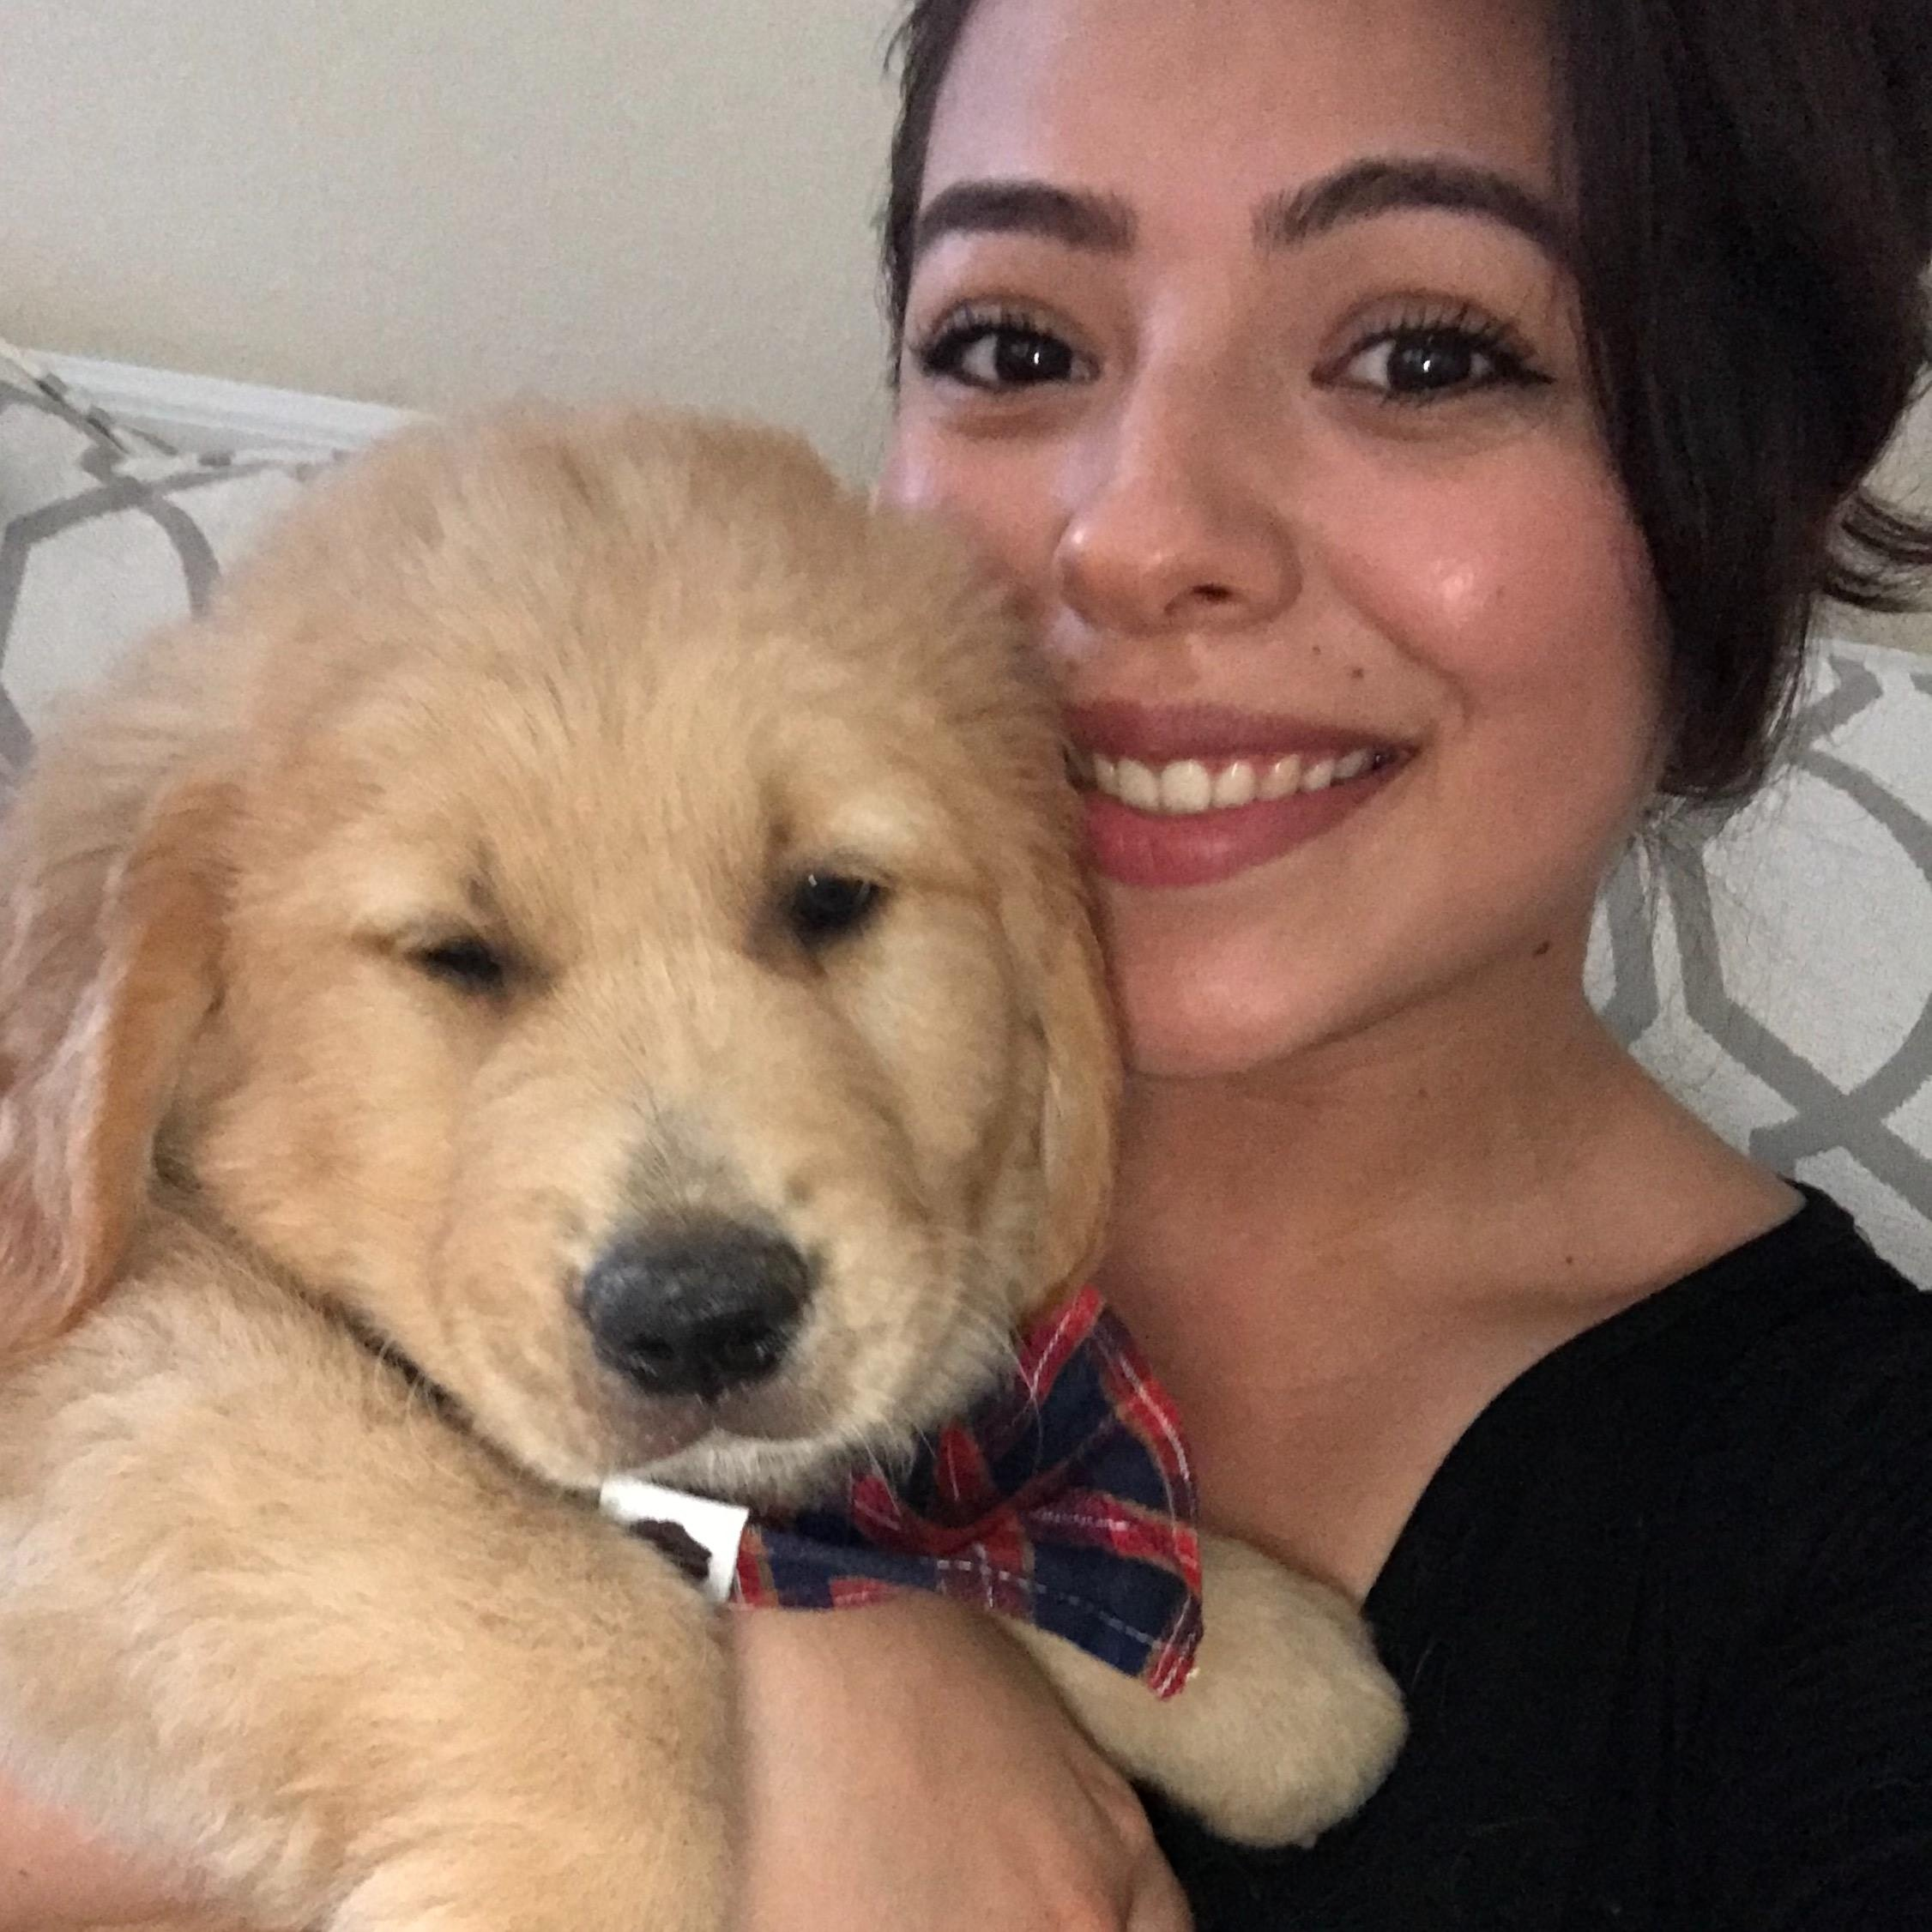 Jacqueline's dog day care